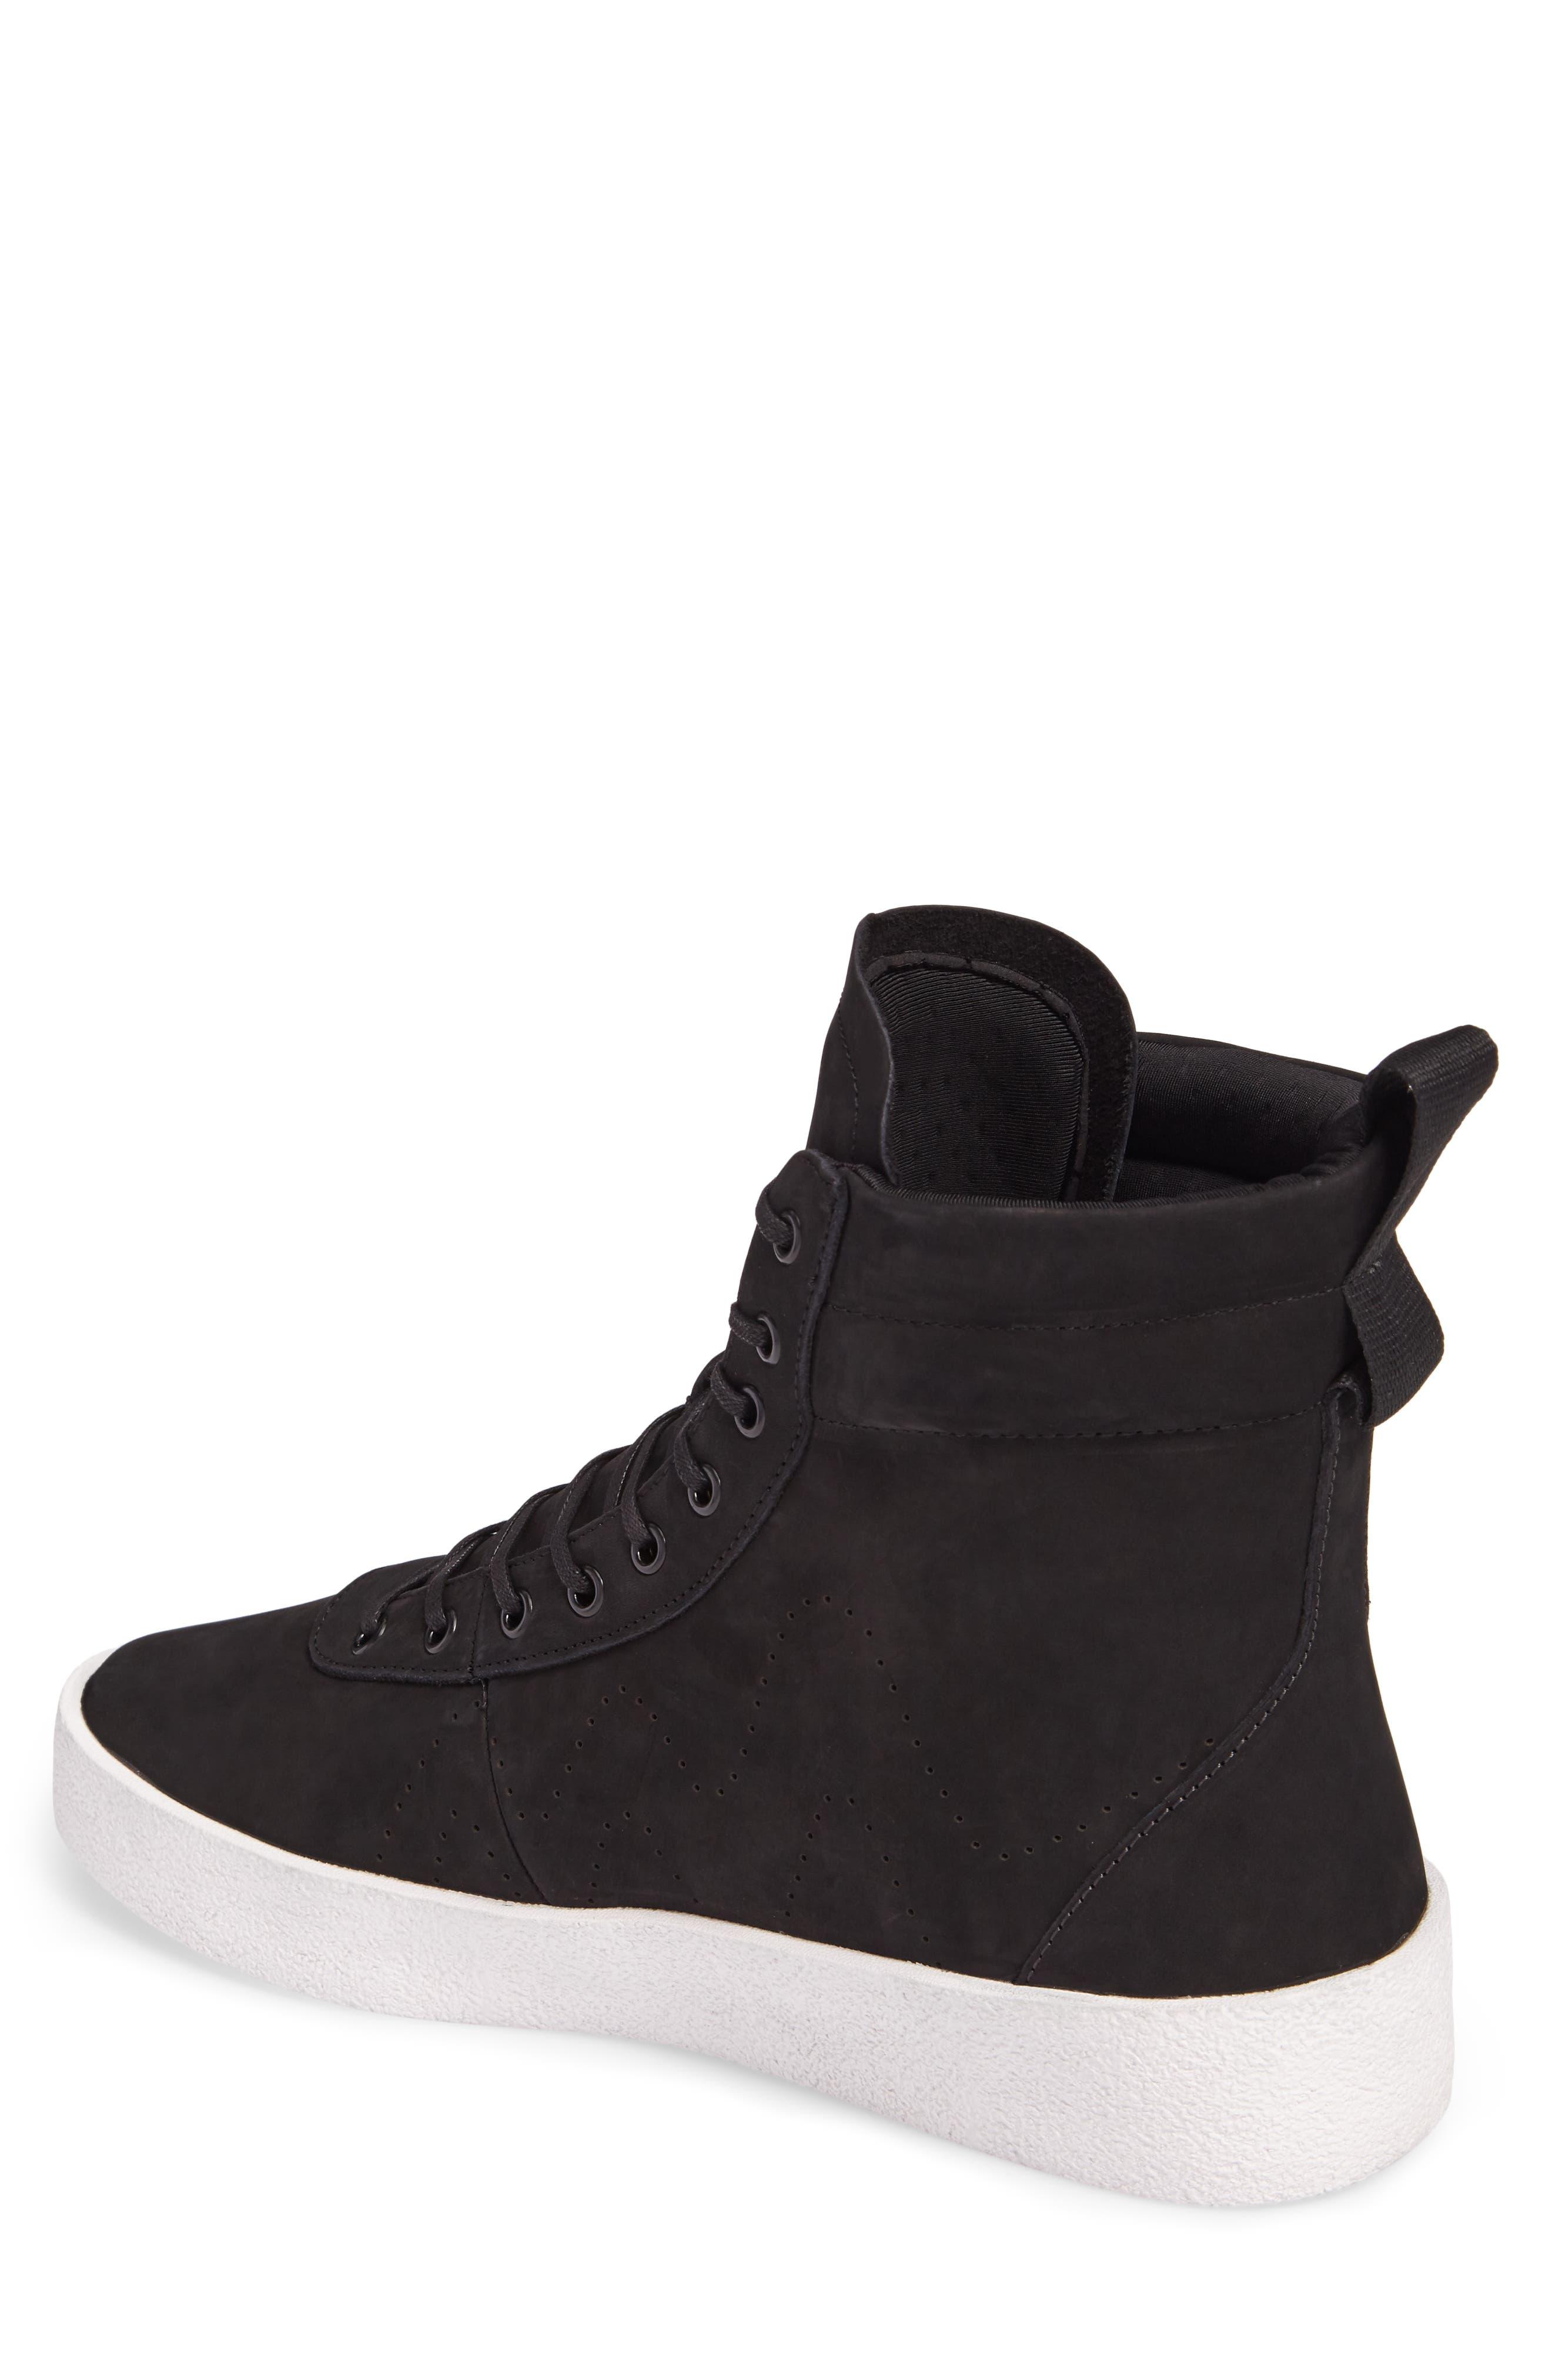 Highlander High Top Sneaker,                             Alternate thumbnail 2, color,                             001